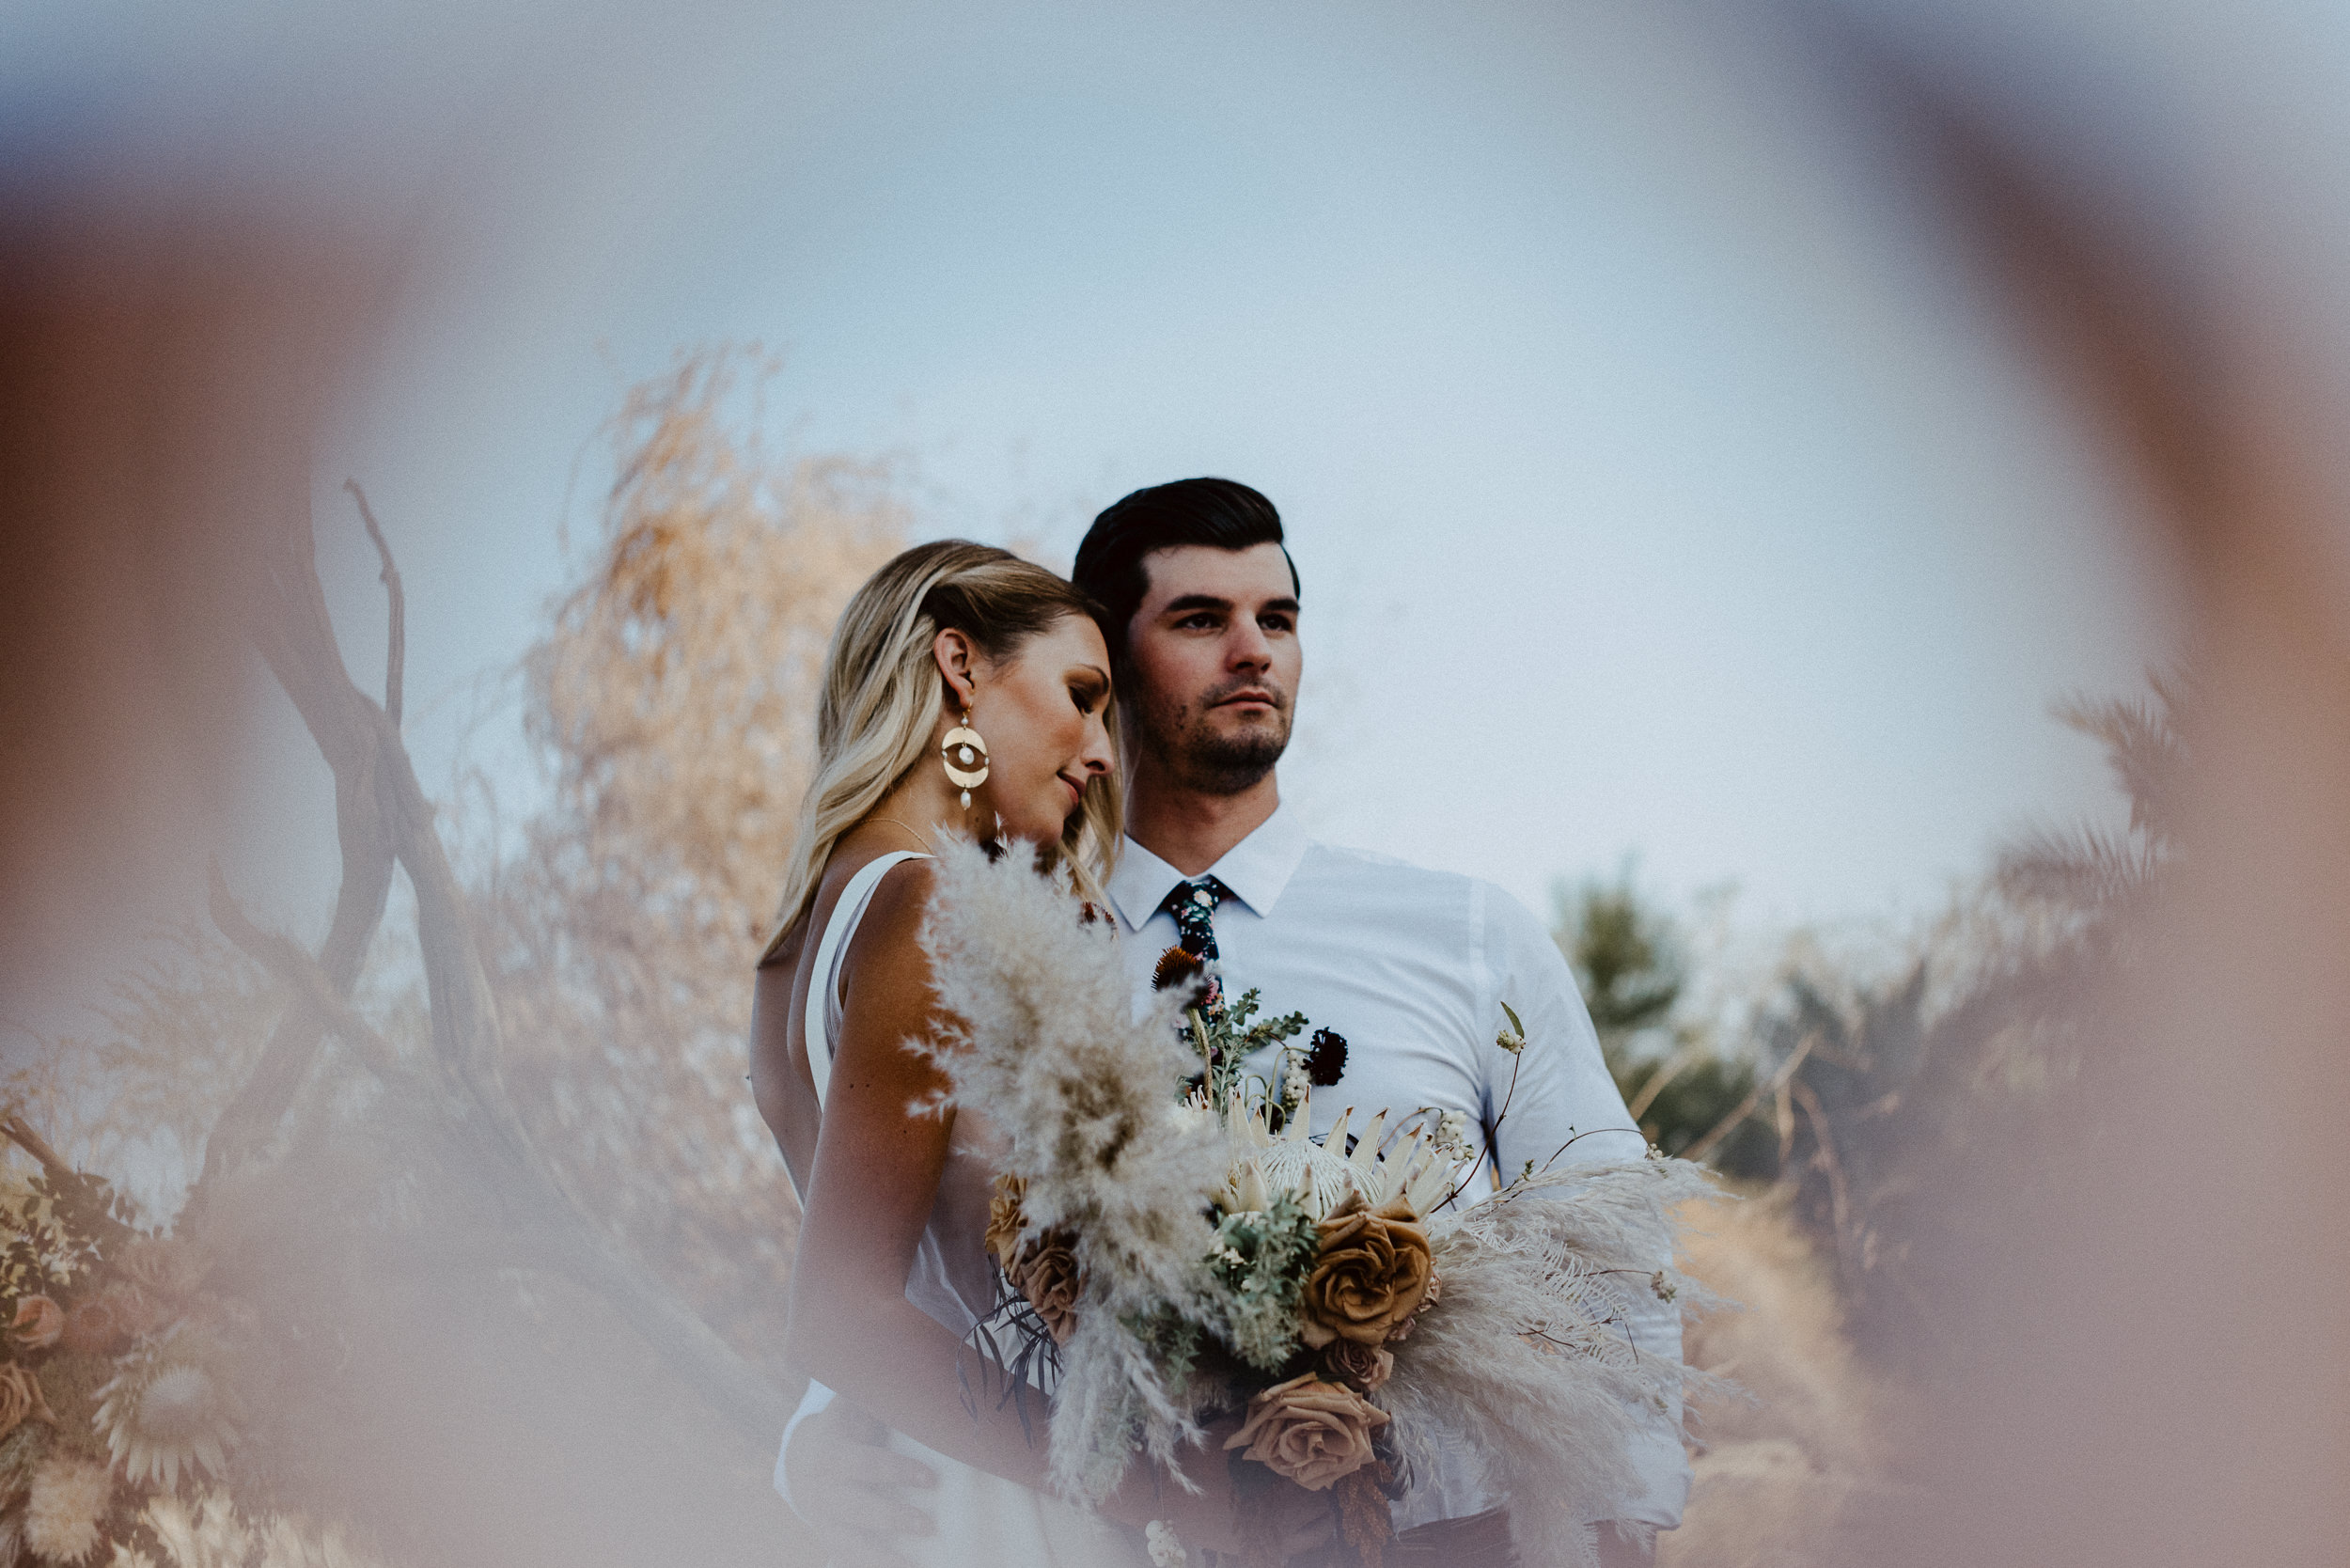 sChelsie + Chris - The Desert Shootout Wedding Romantics at The Living Desert-52.jpg